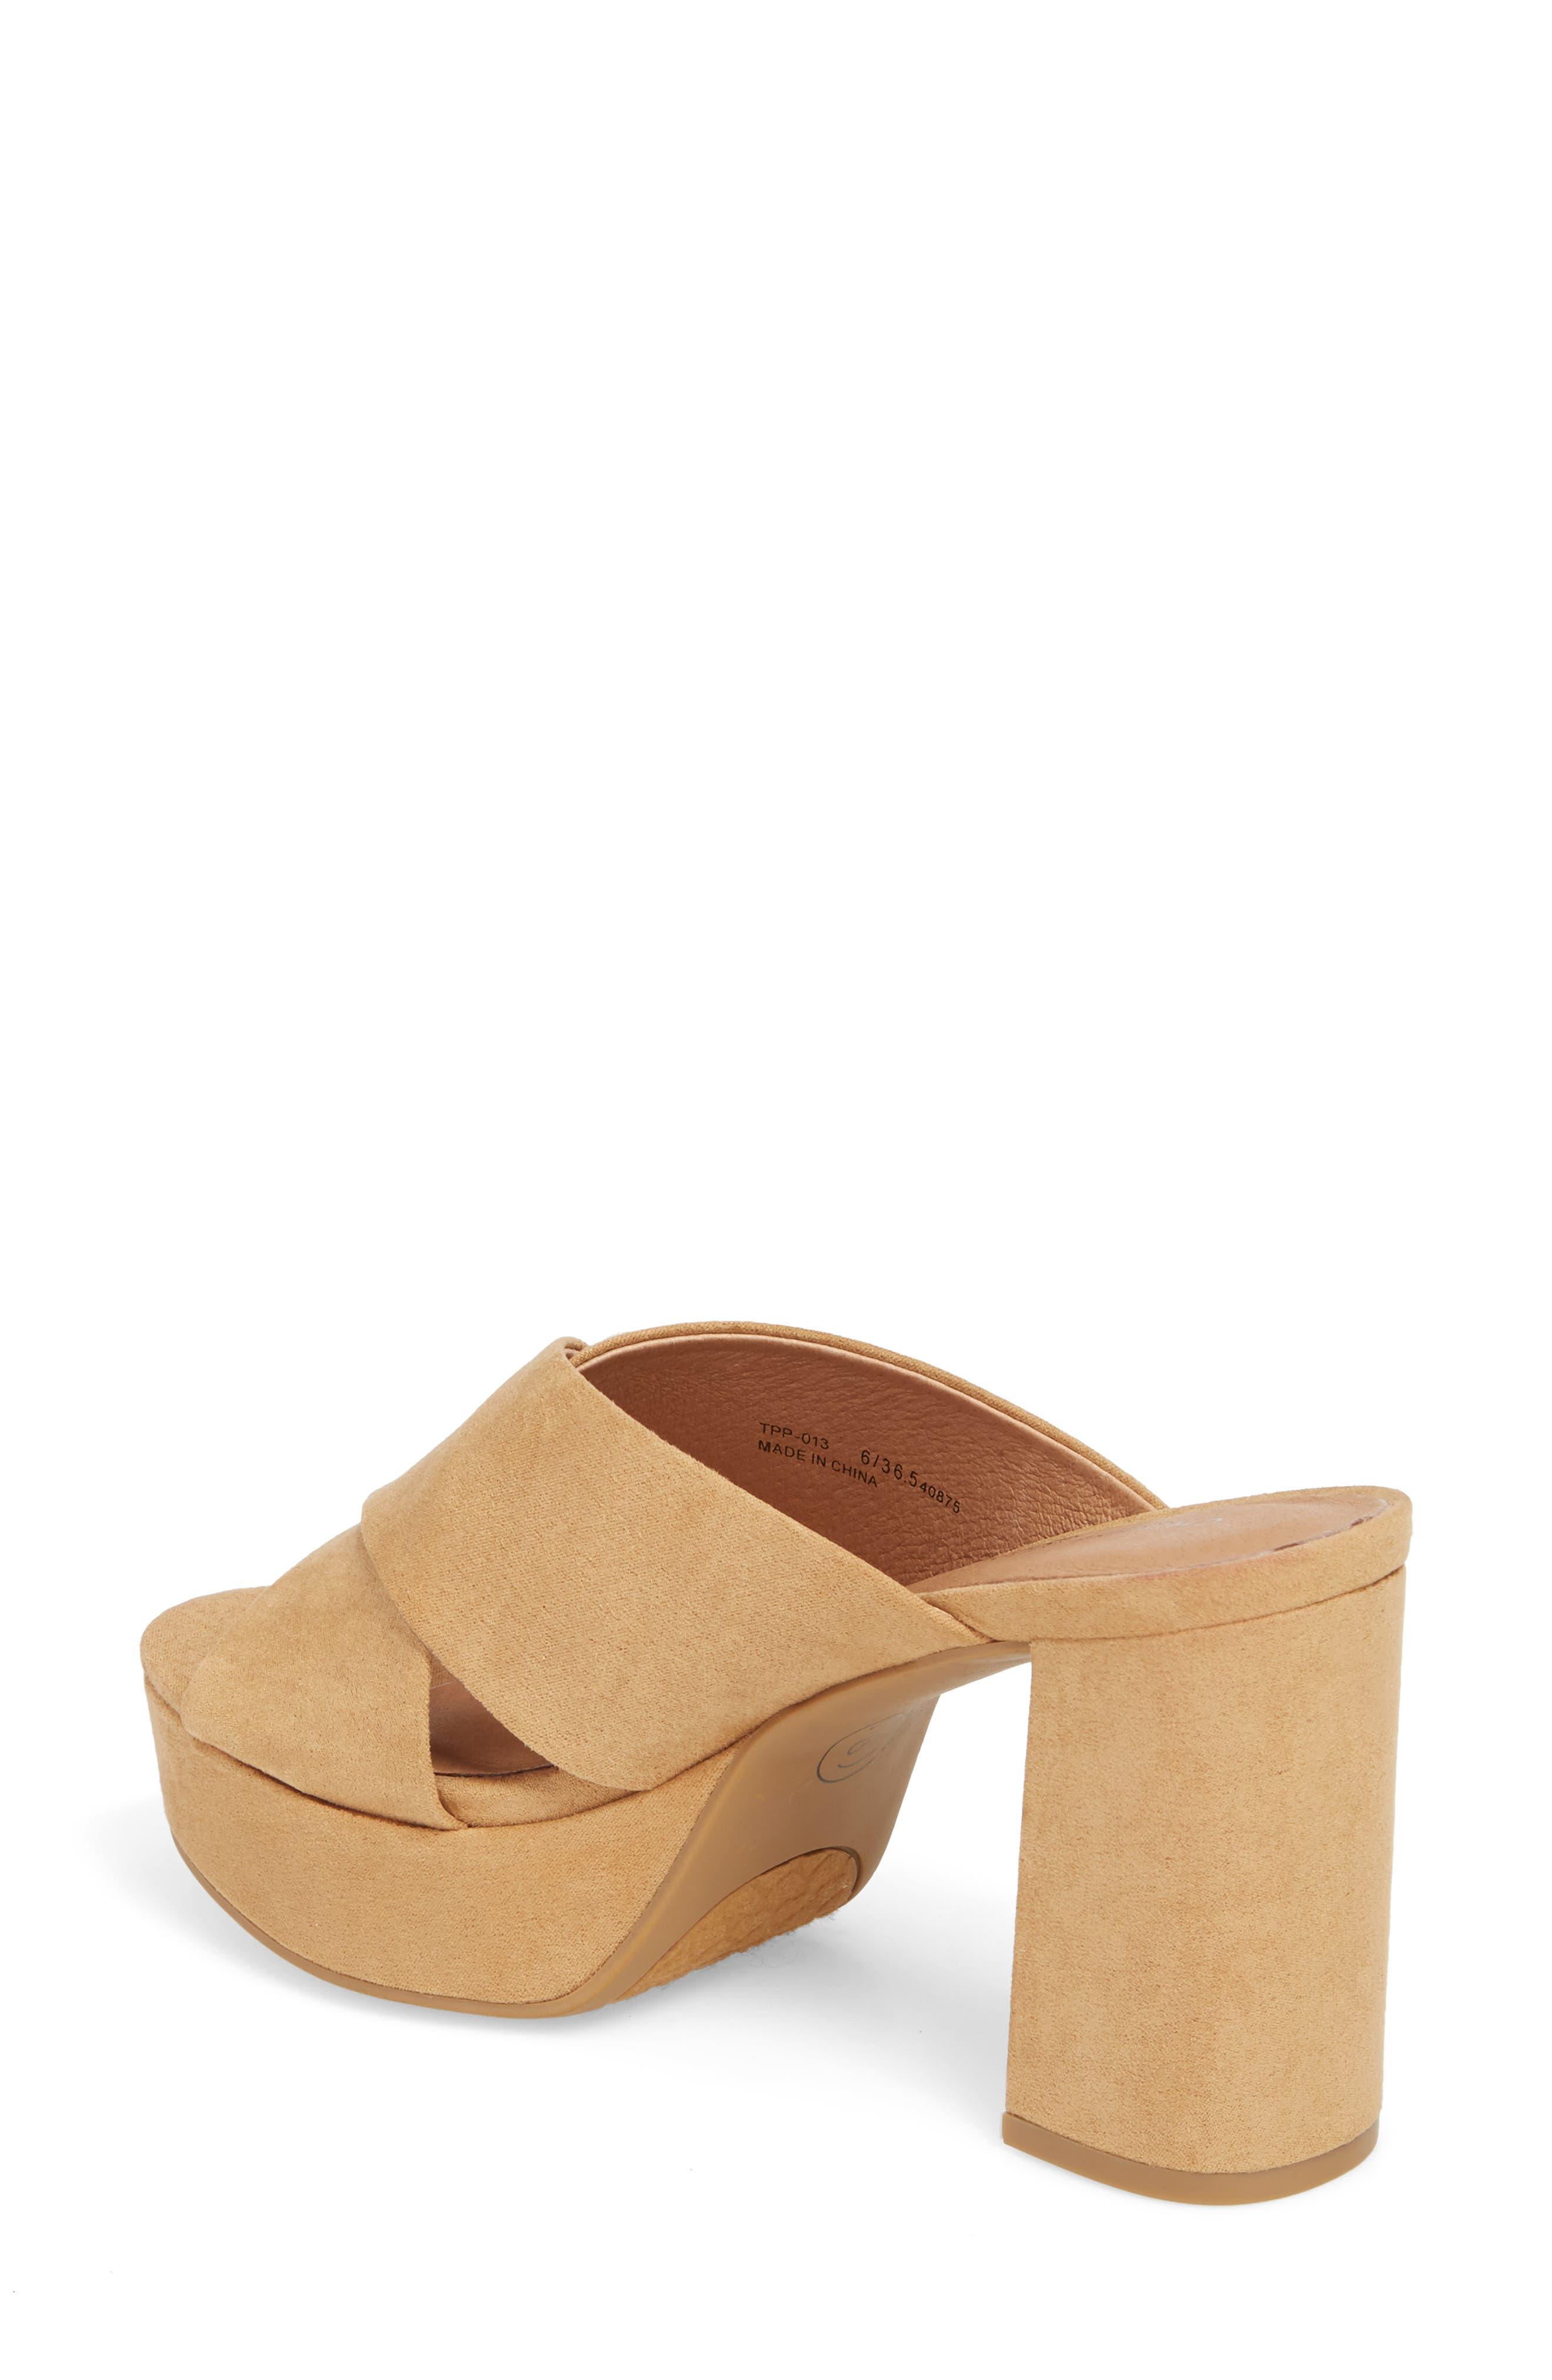 Teagan Cross Strap Platform Sandal,                             Alternate thumbnail 2, color,                             Camel